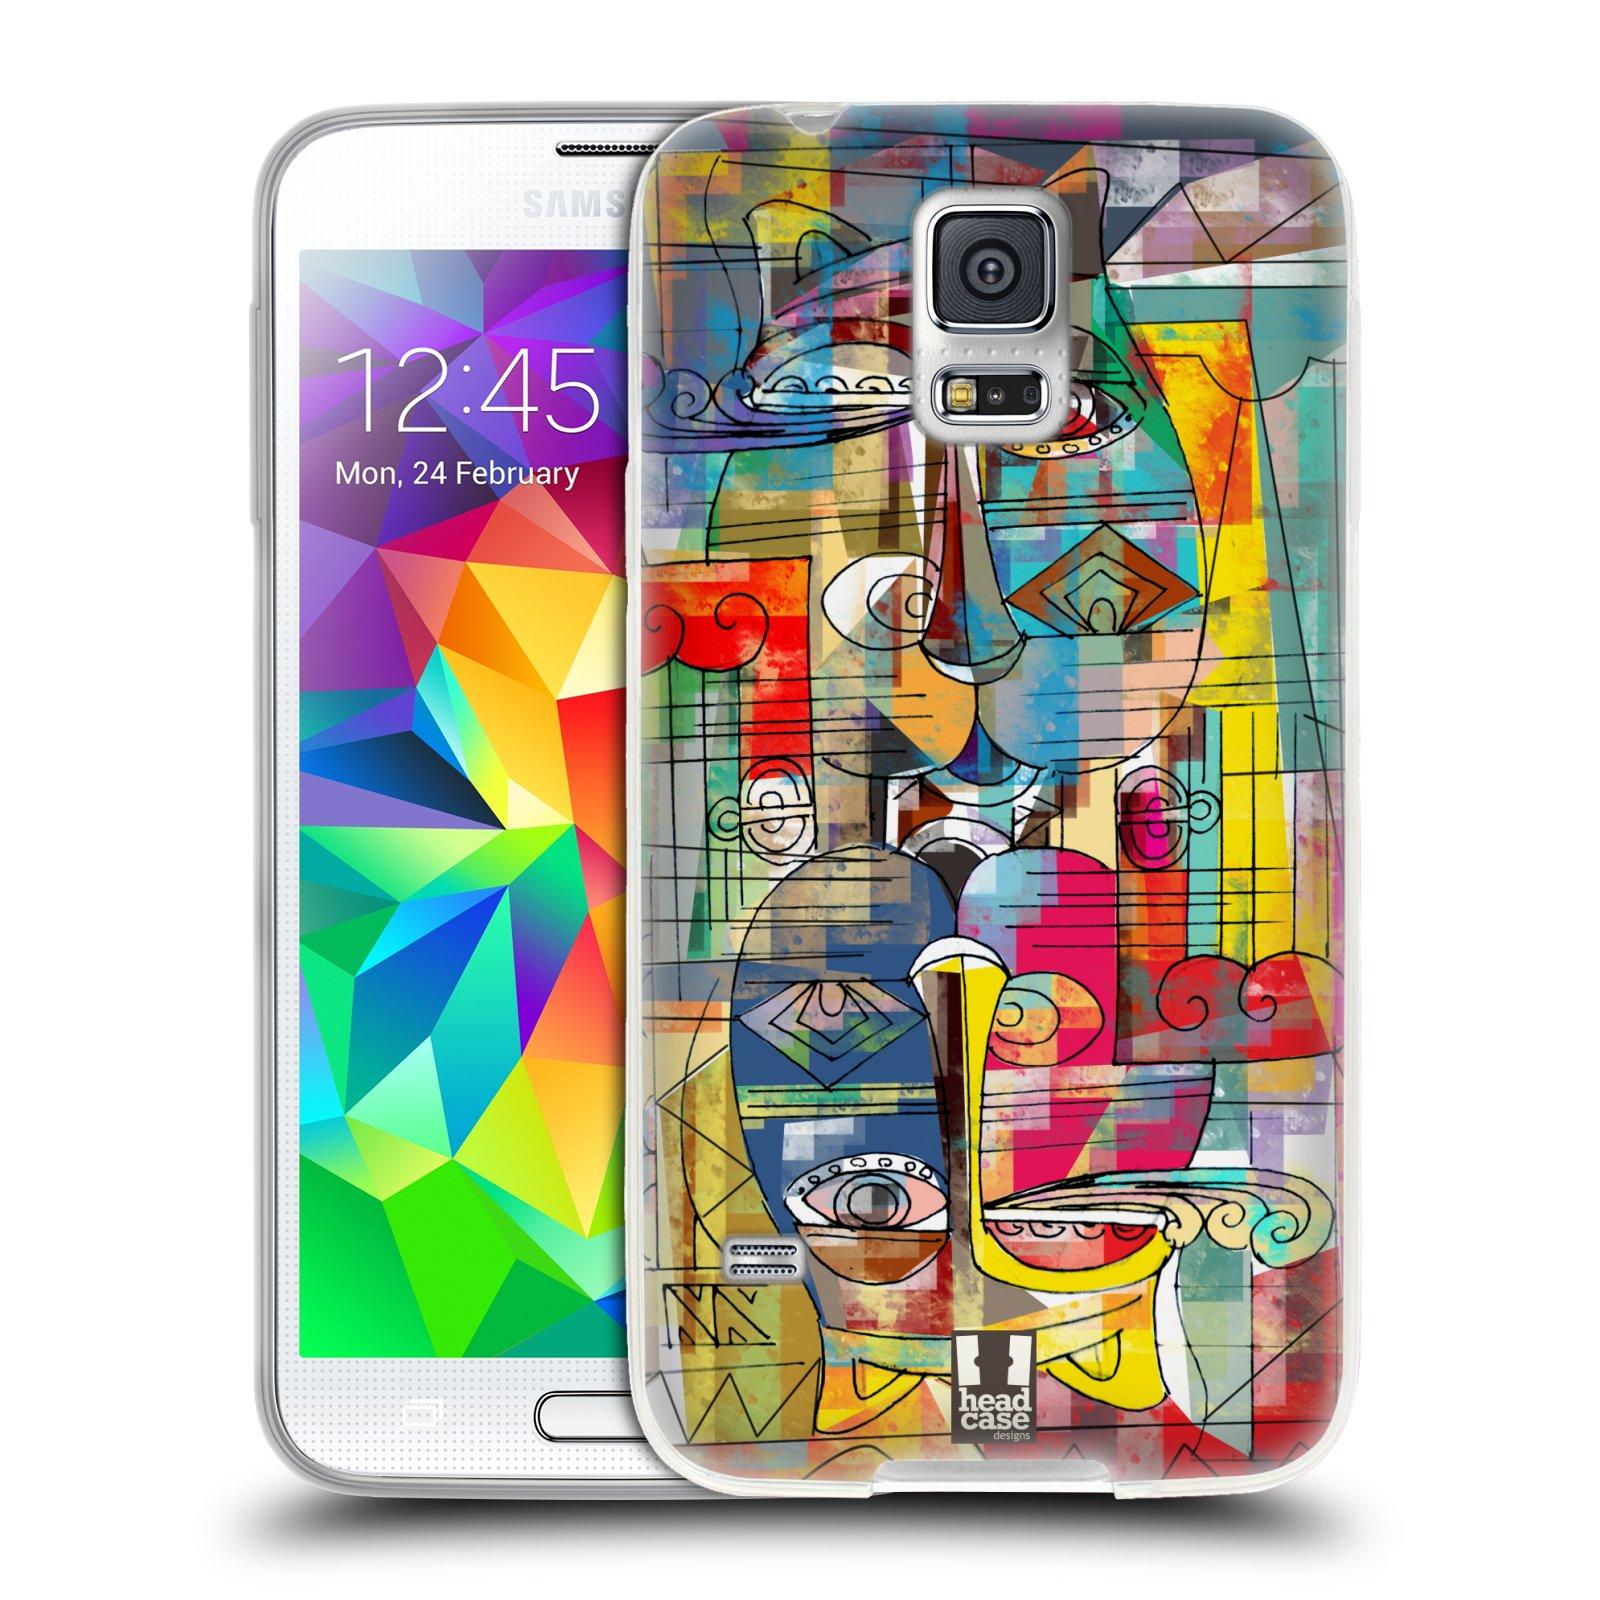 Silikonové pouzdro na mobil Samsung Galaxy S5 HEAD CASE AZTEC MANX